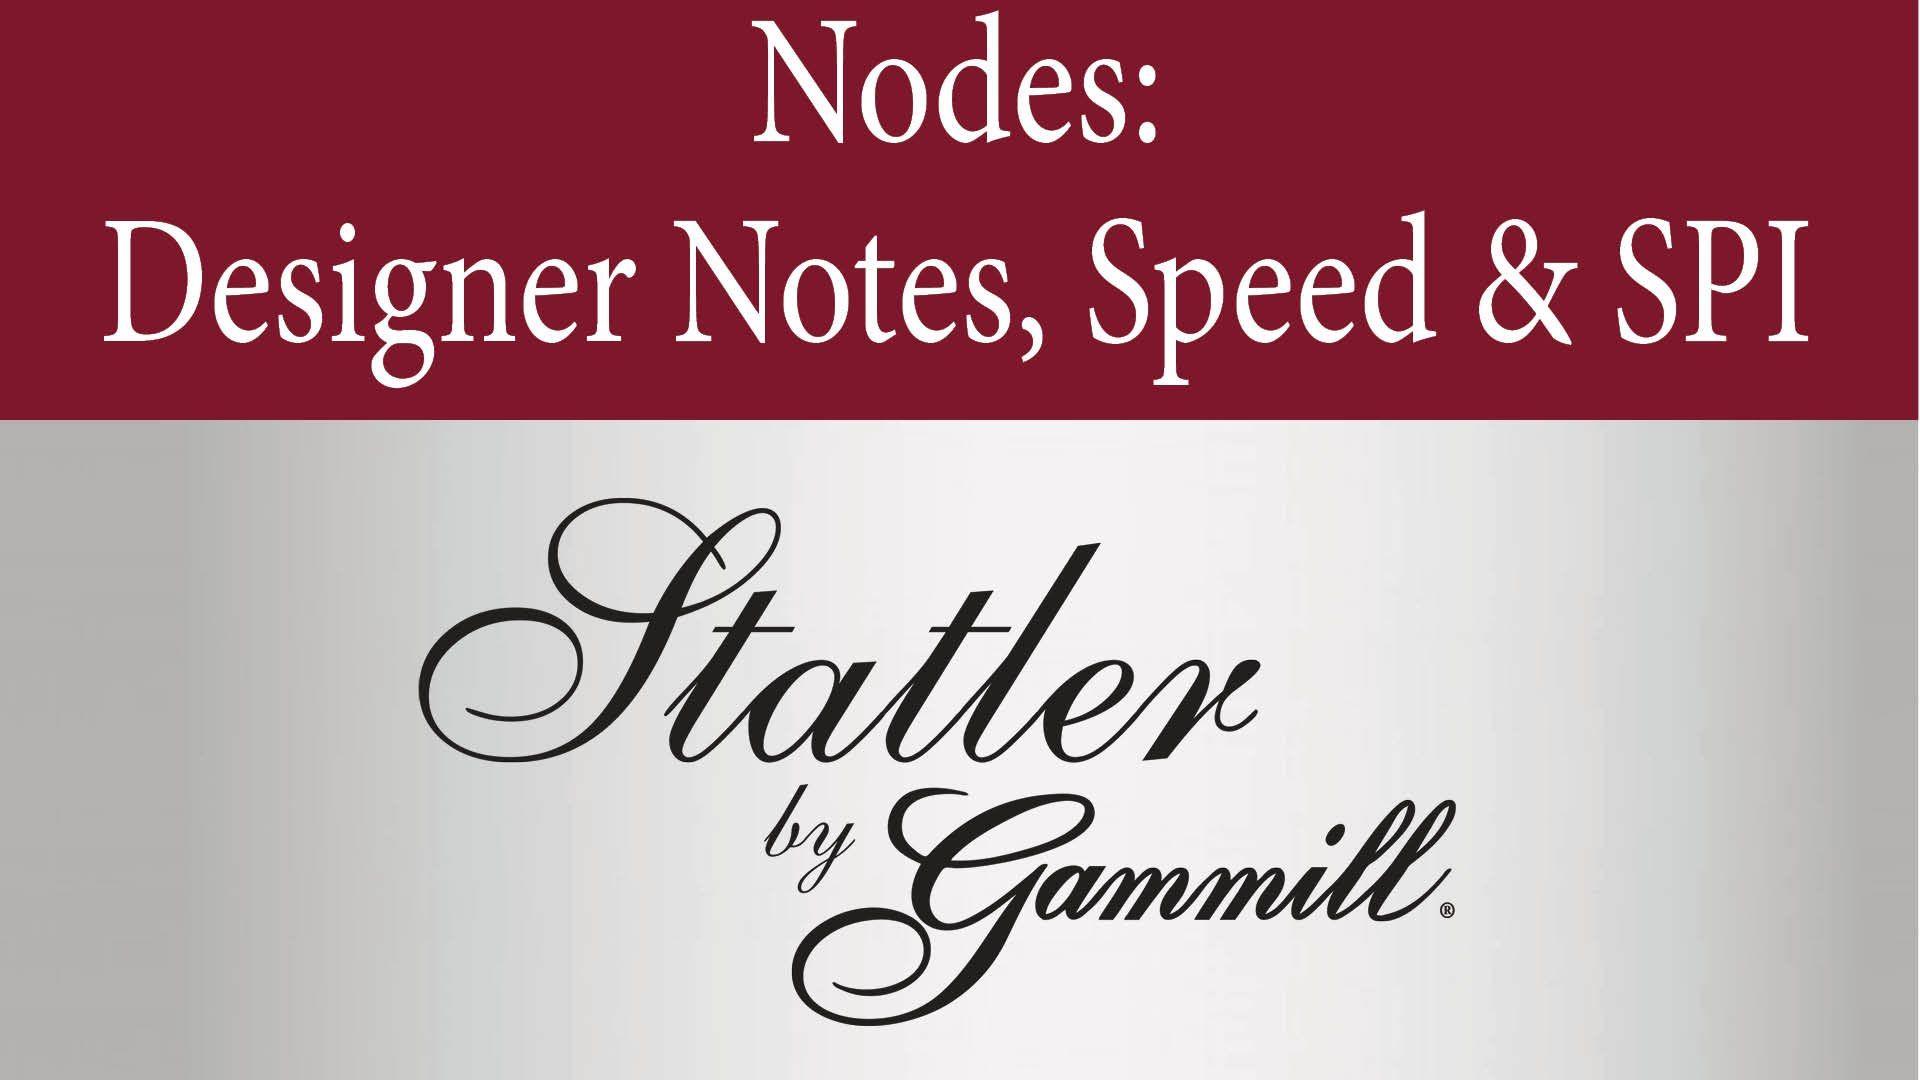 Nodes Designer Notes, Speed and SPI | Gammill Quilting